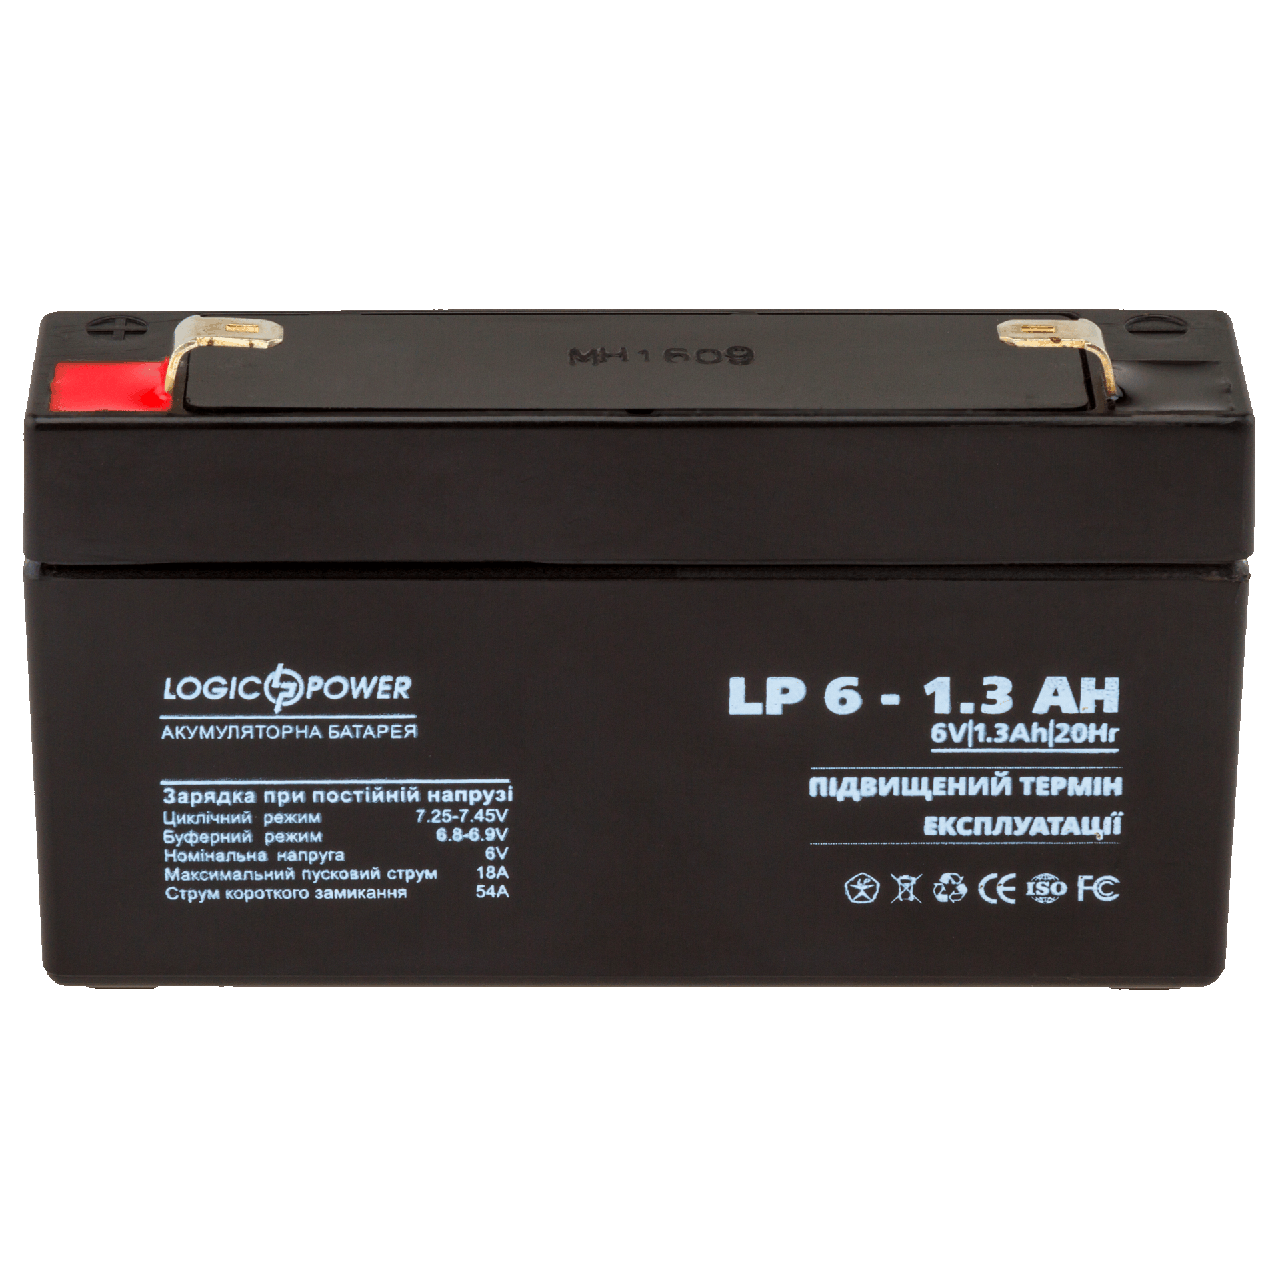 Logicpower 6V 1.3Ah